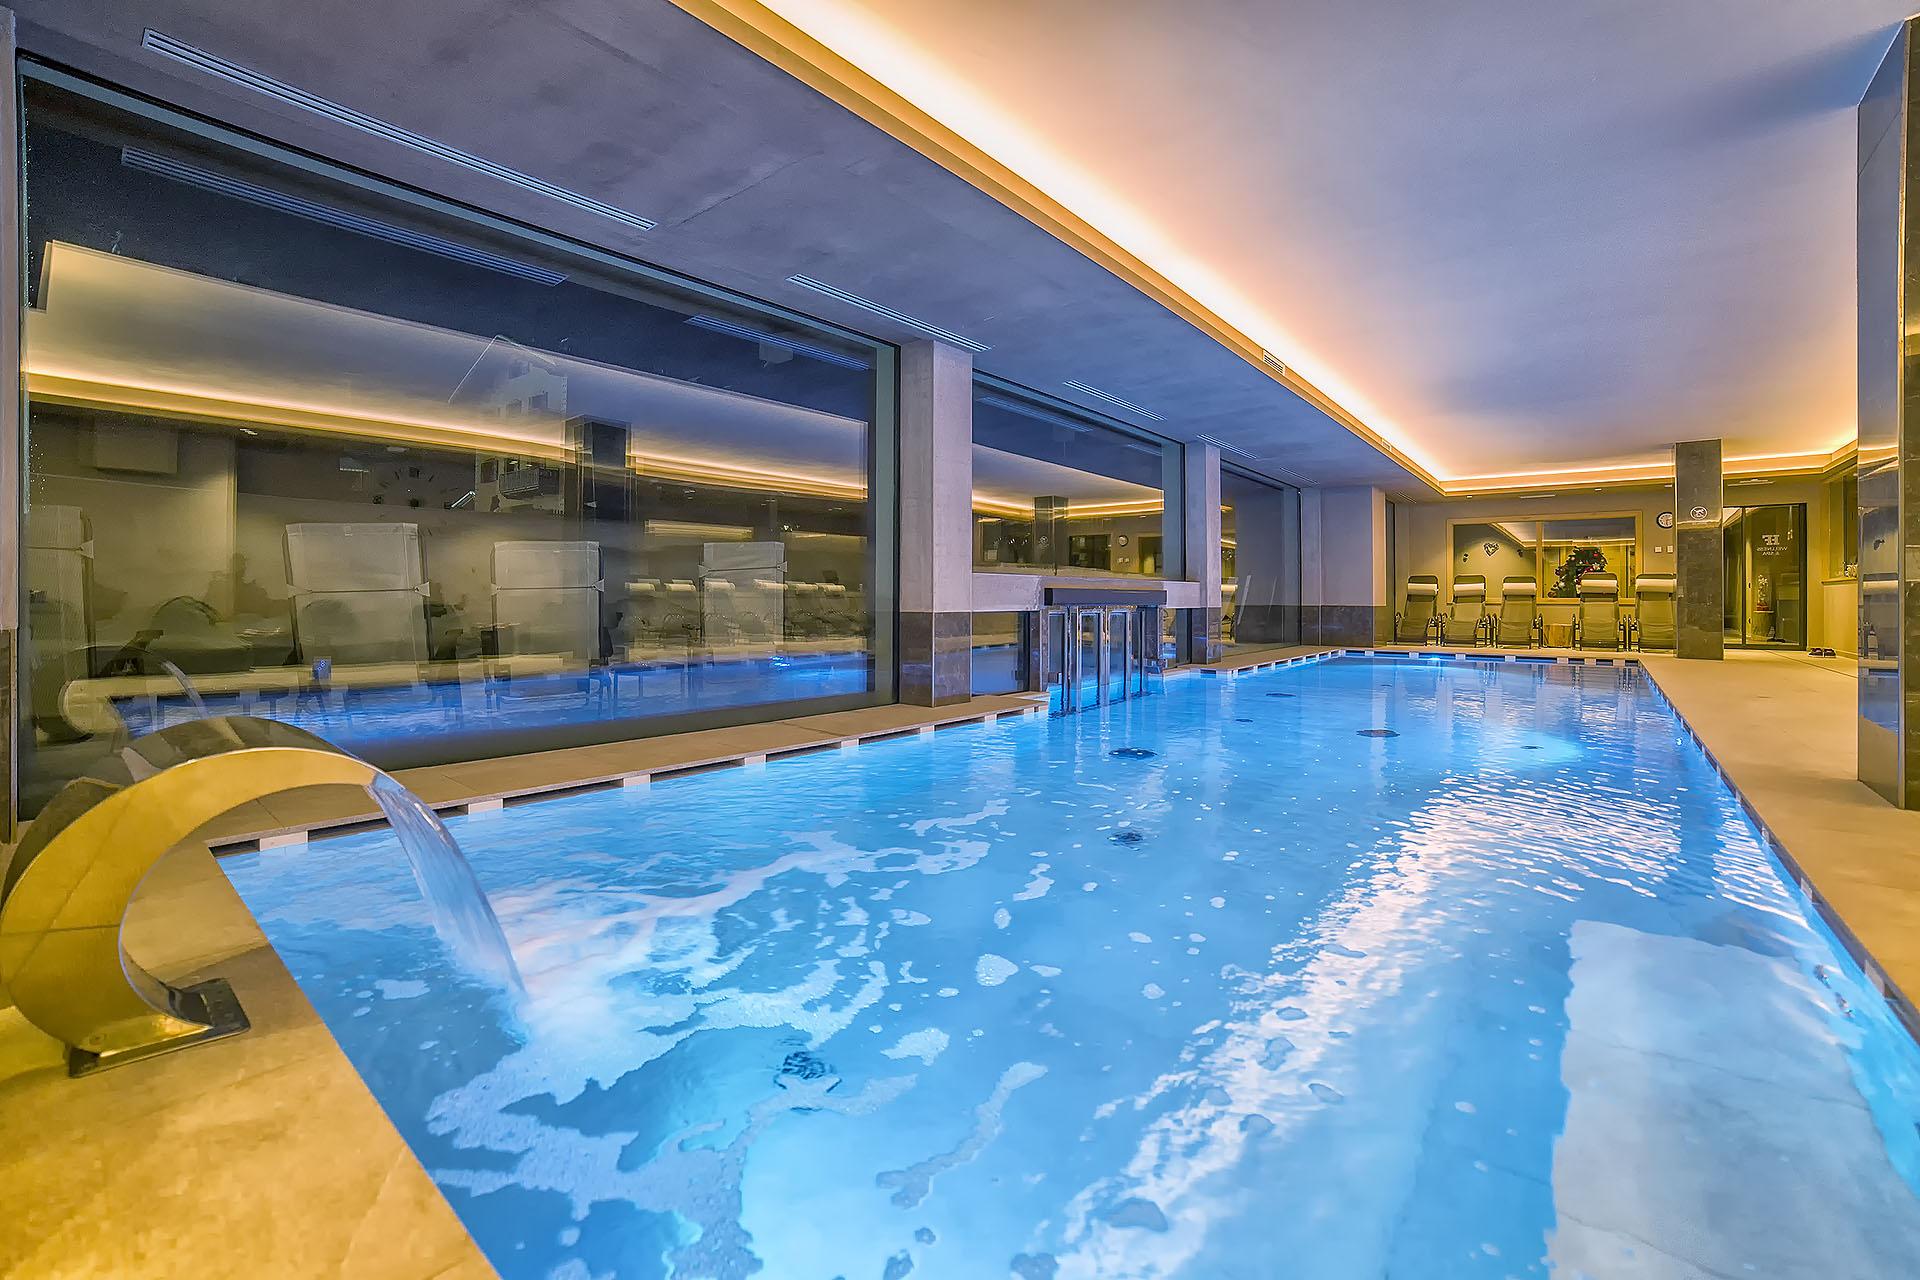 PISCINA INTERNA<br /> ACTIVE HOTEL FRANCESIN - LIVIGNO